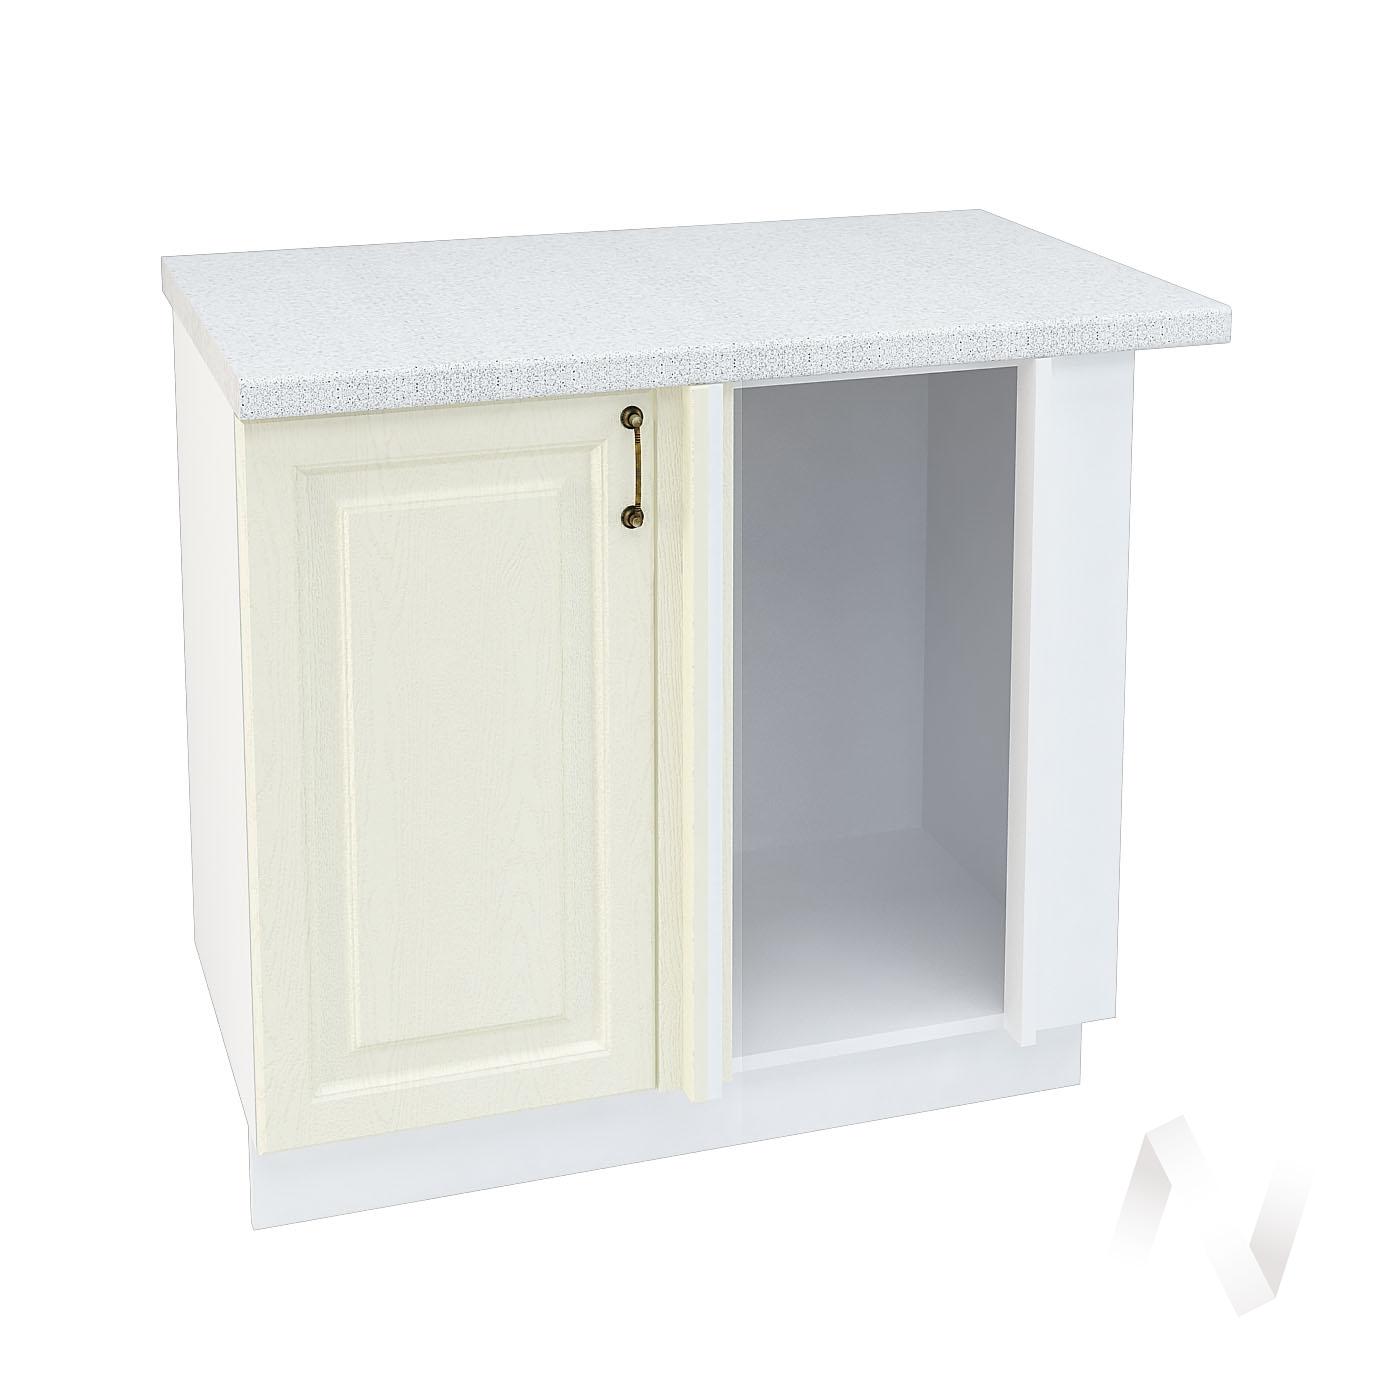 "Кухня ""Ницца"": Шкаф нижний угловой 990М, ШНУ 990М (Крем/корпус белый)"